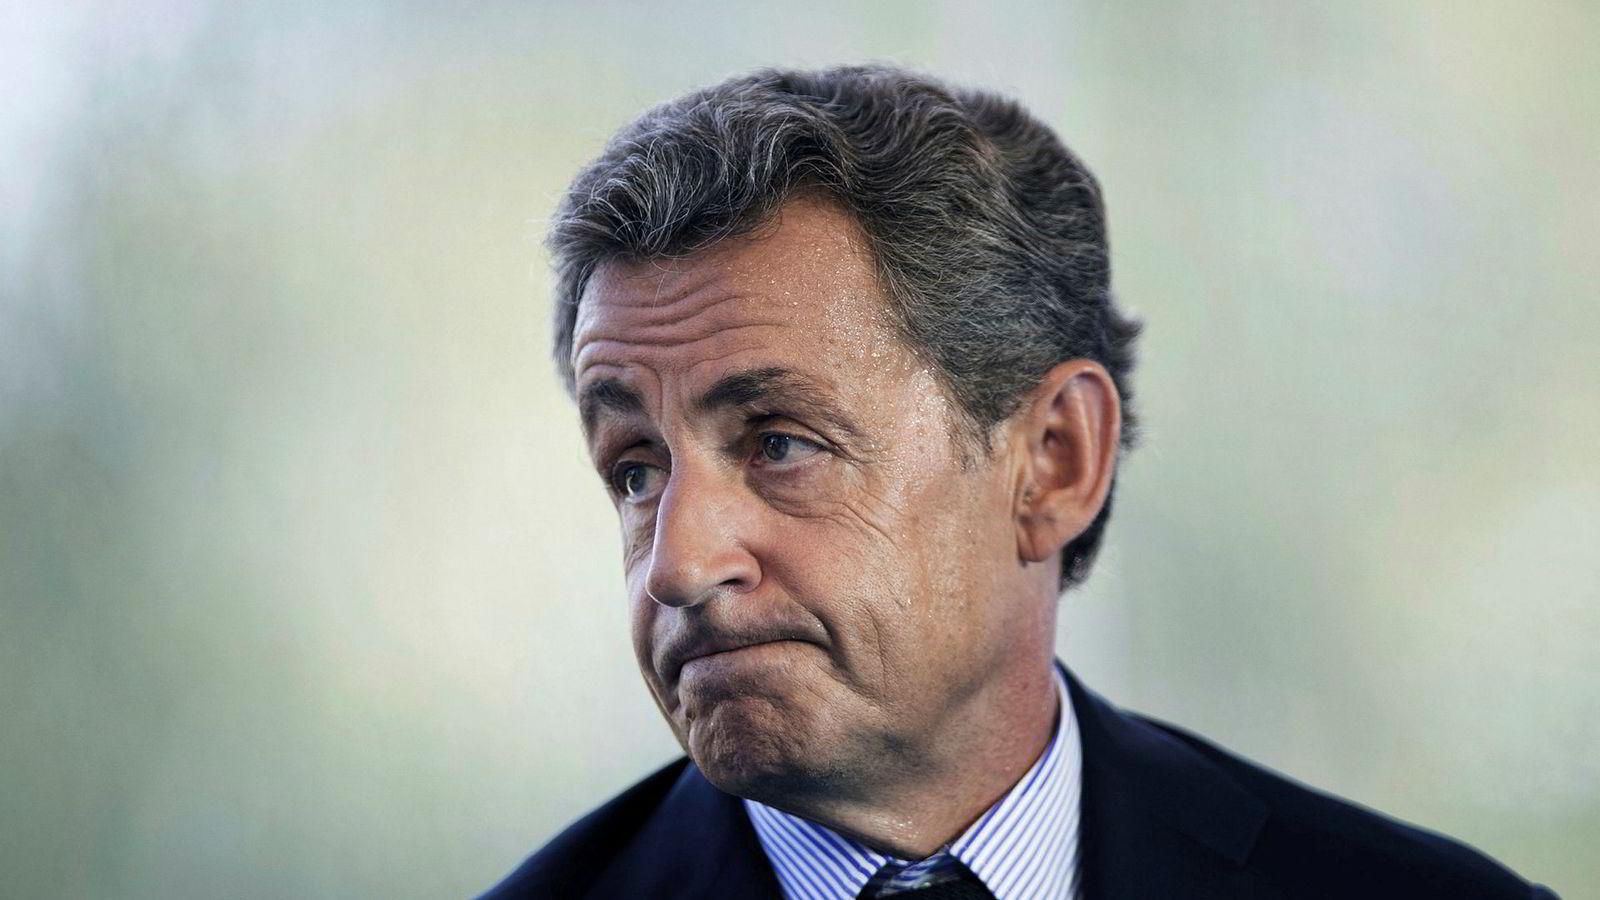 Tidligere president Nicolas Sarkozy må møte i retten.